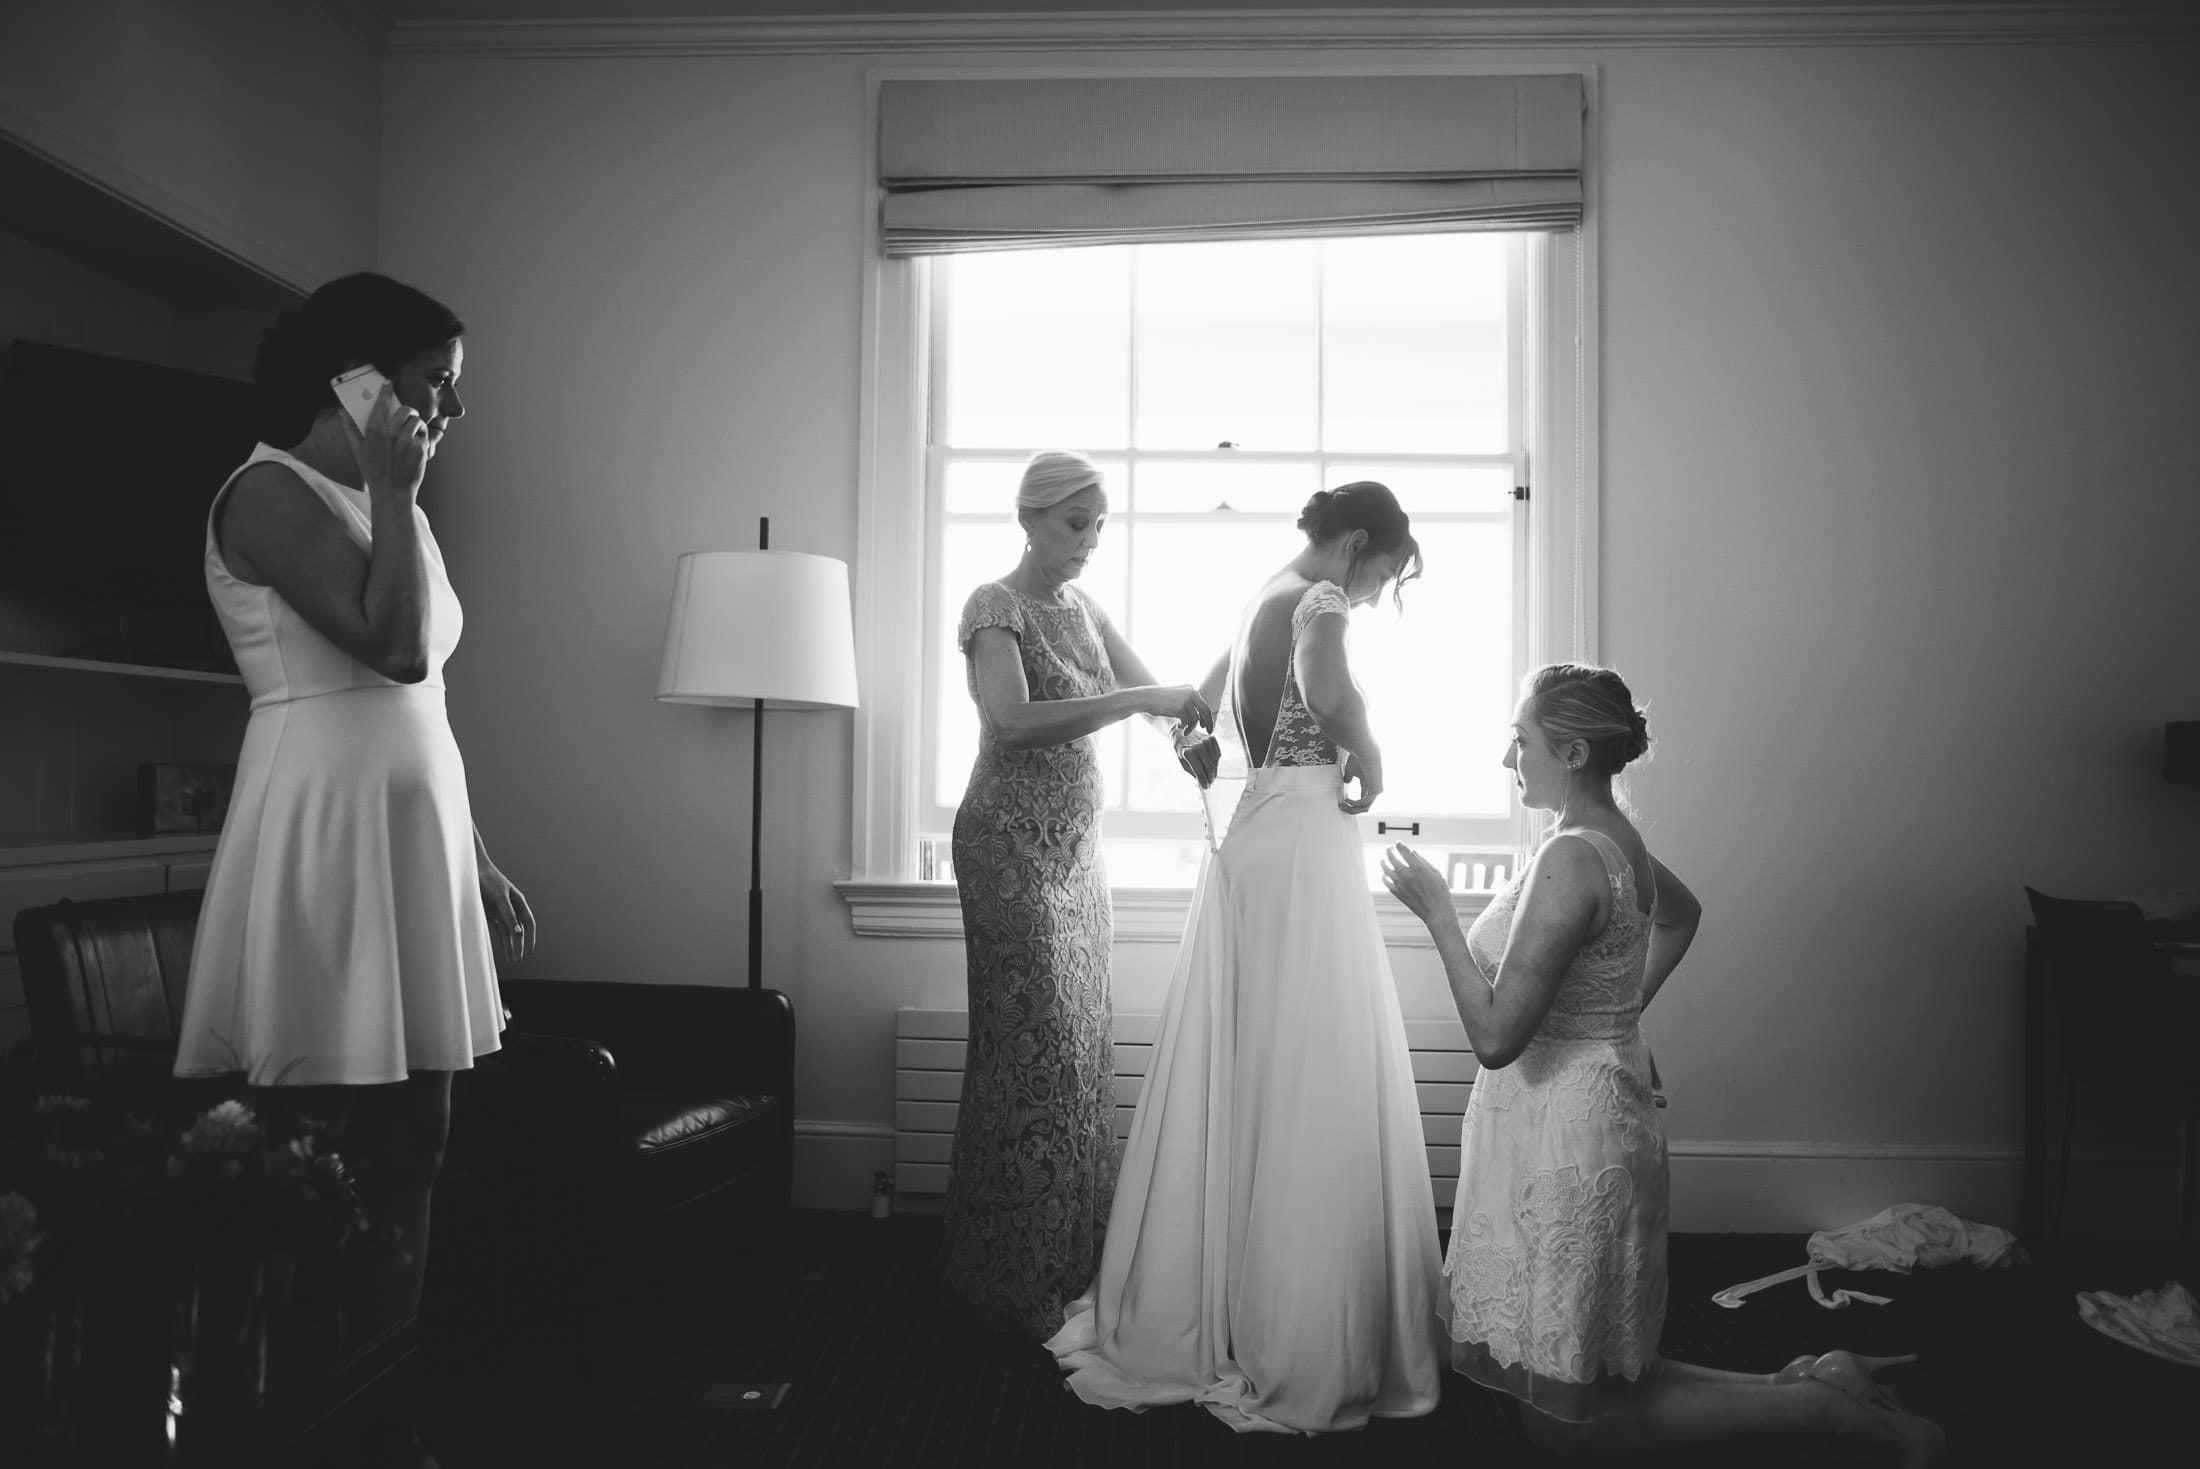 Presidio Inn getting ready pic of bride